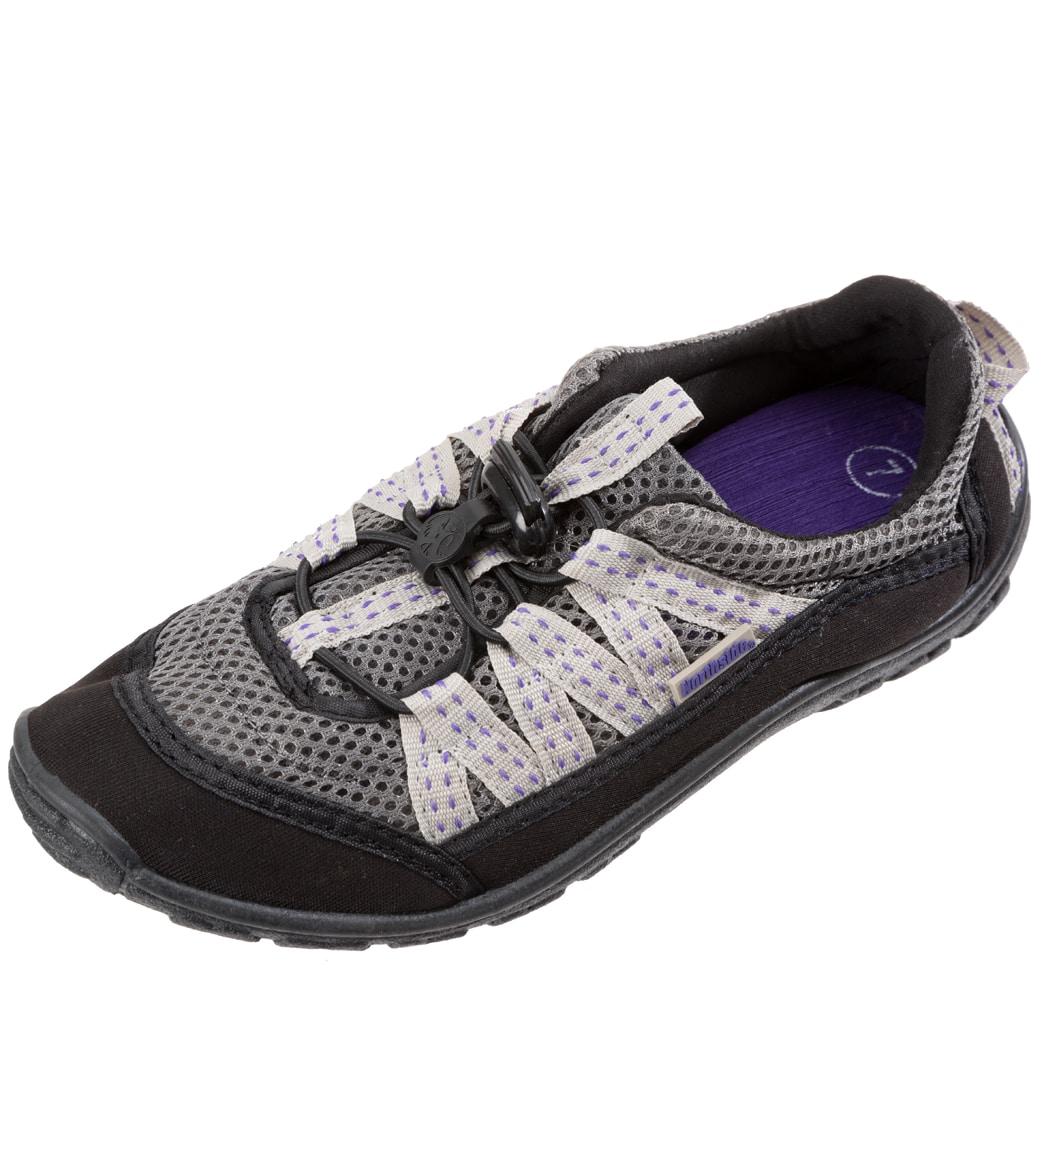 Women's Brille II Water shoe